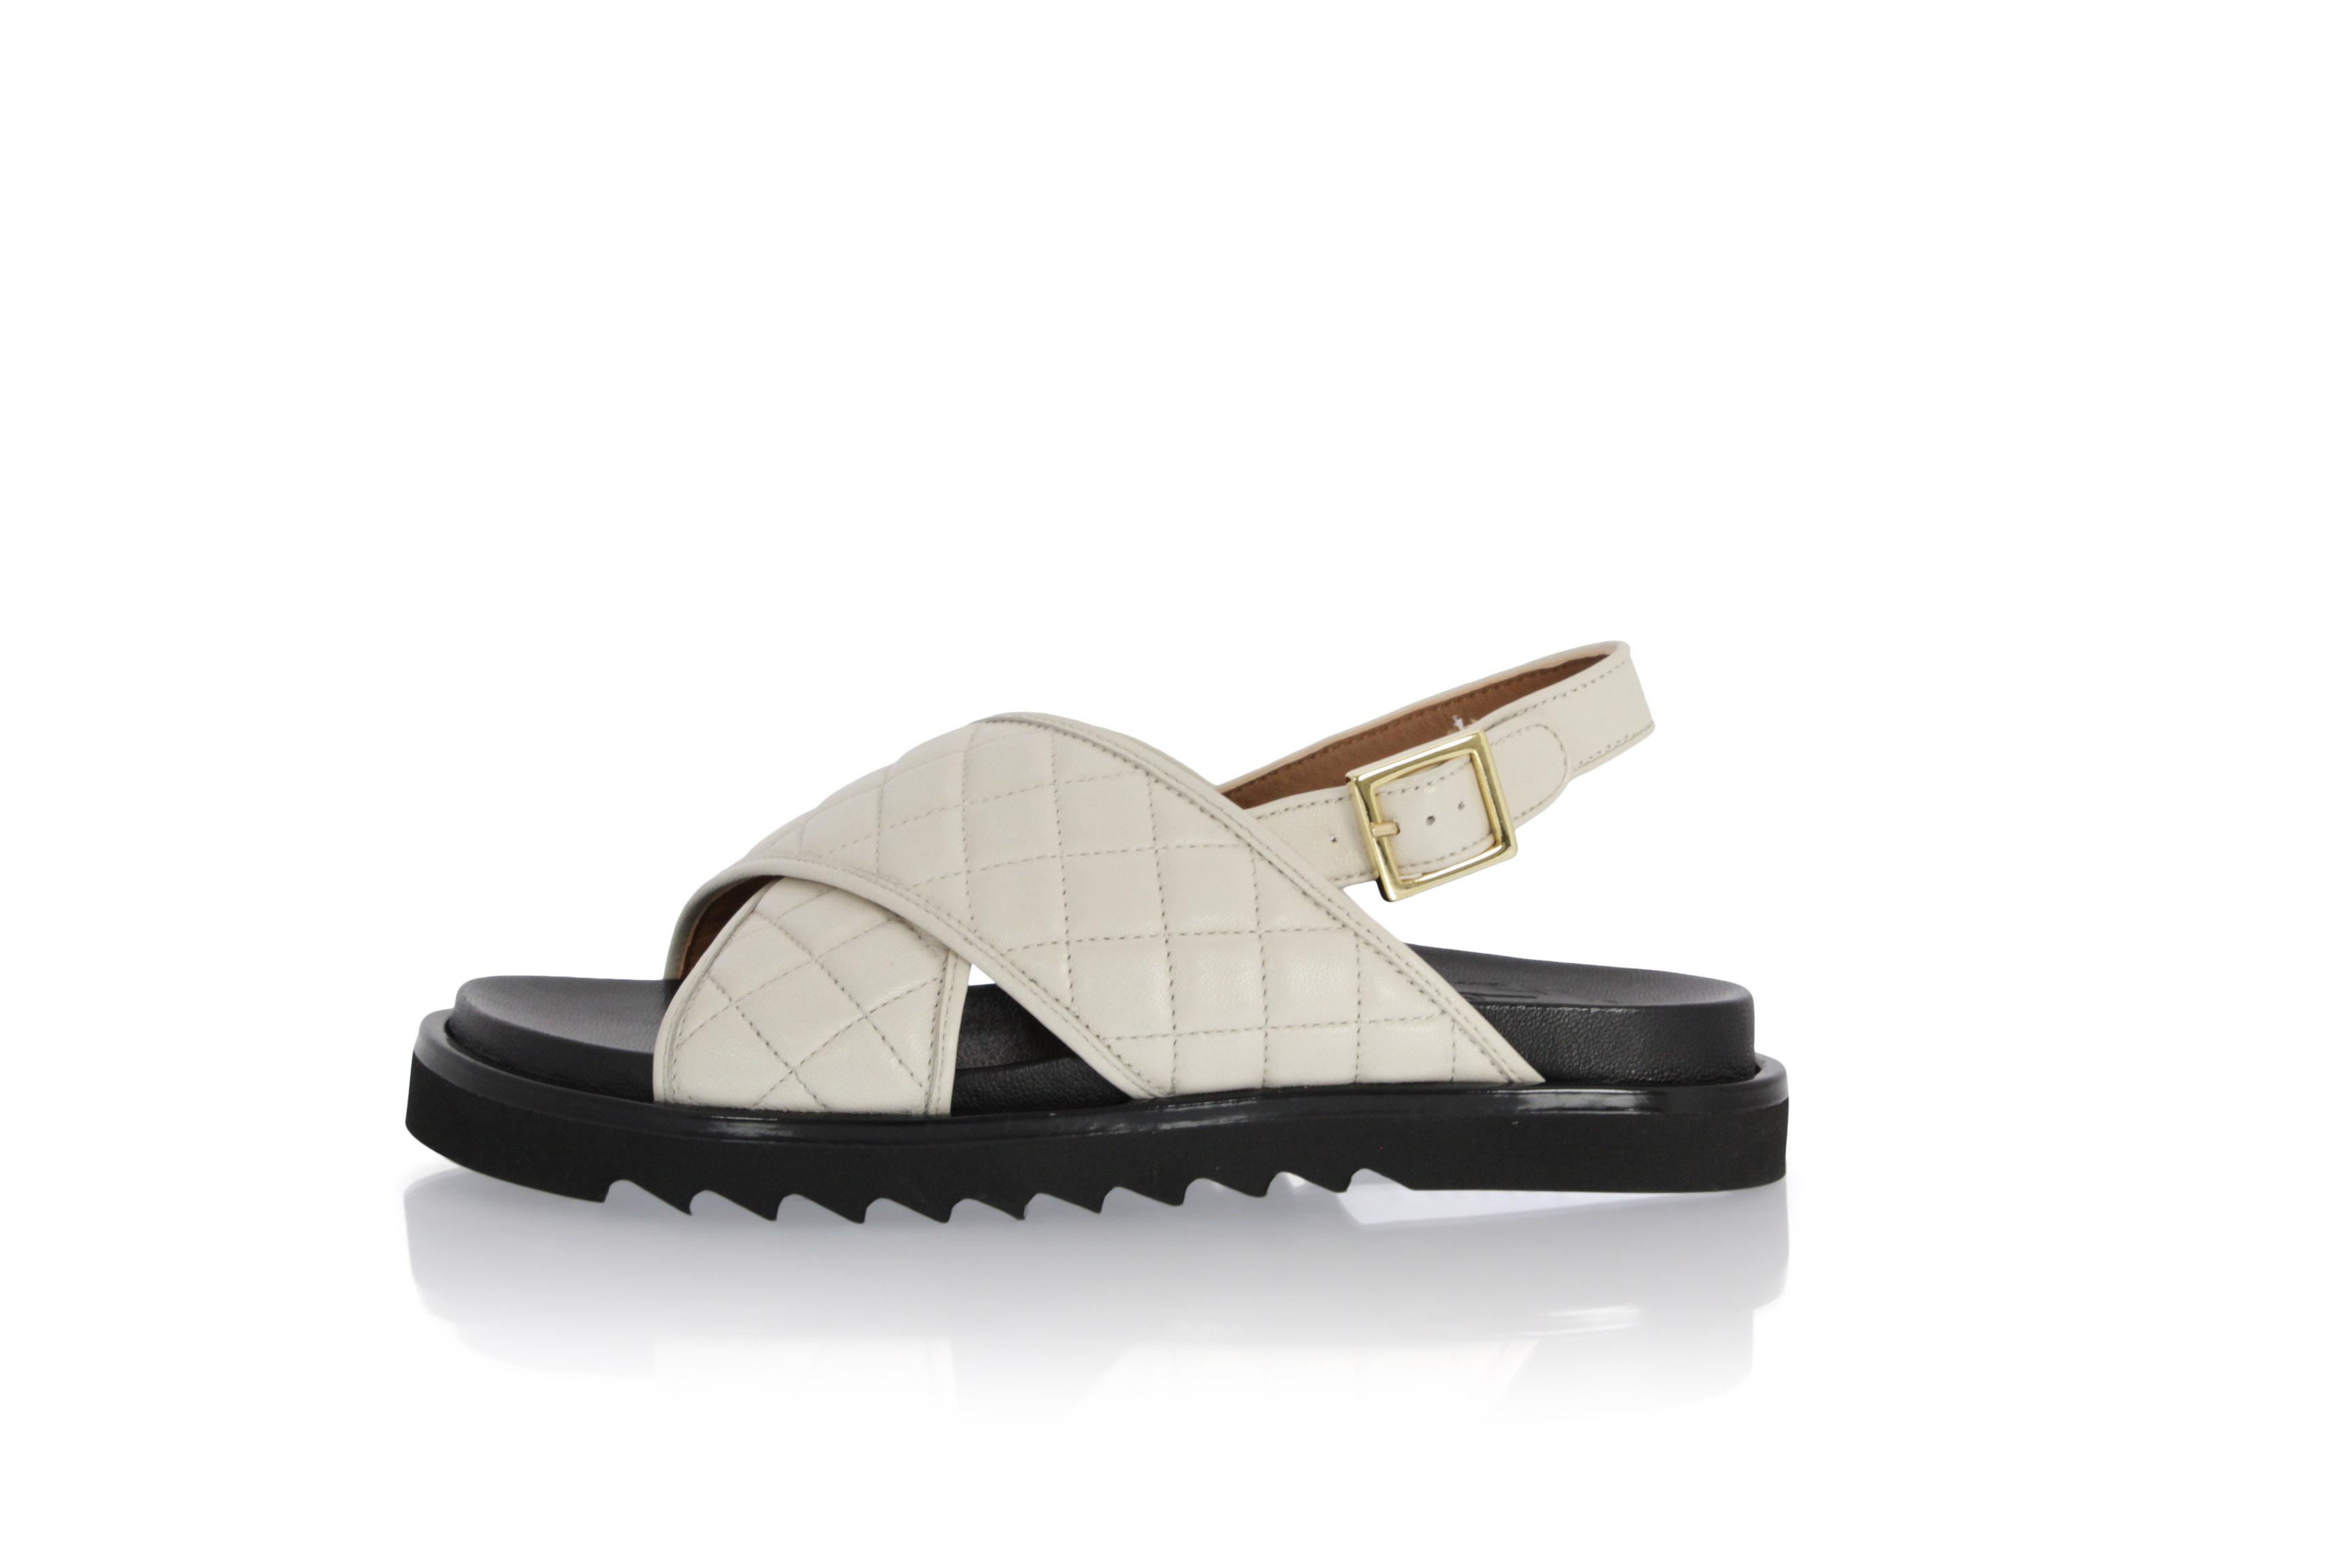 Billi Bi 4190 sandal